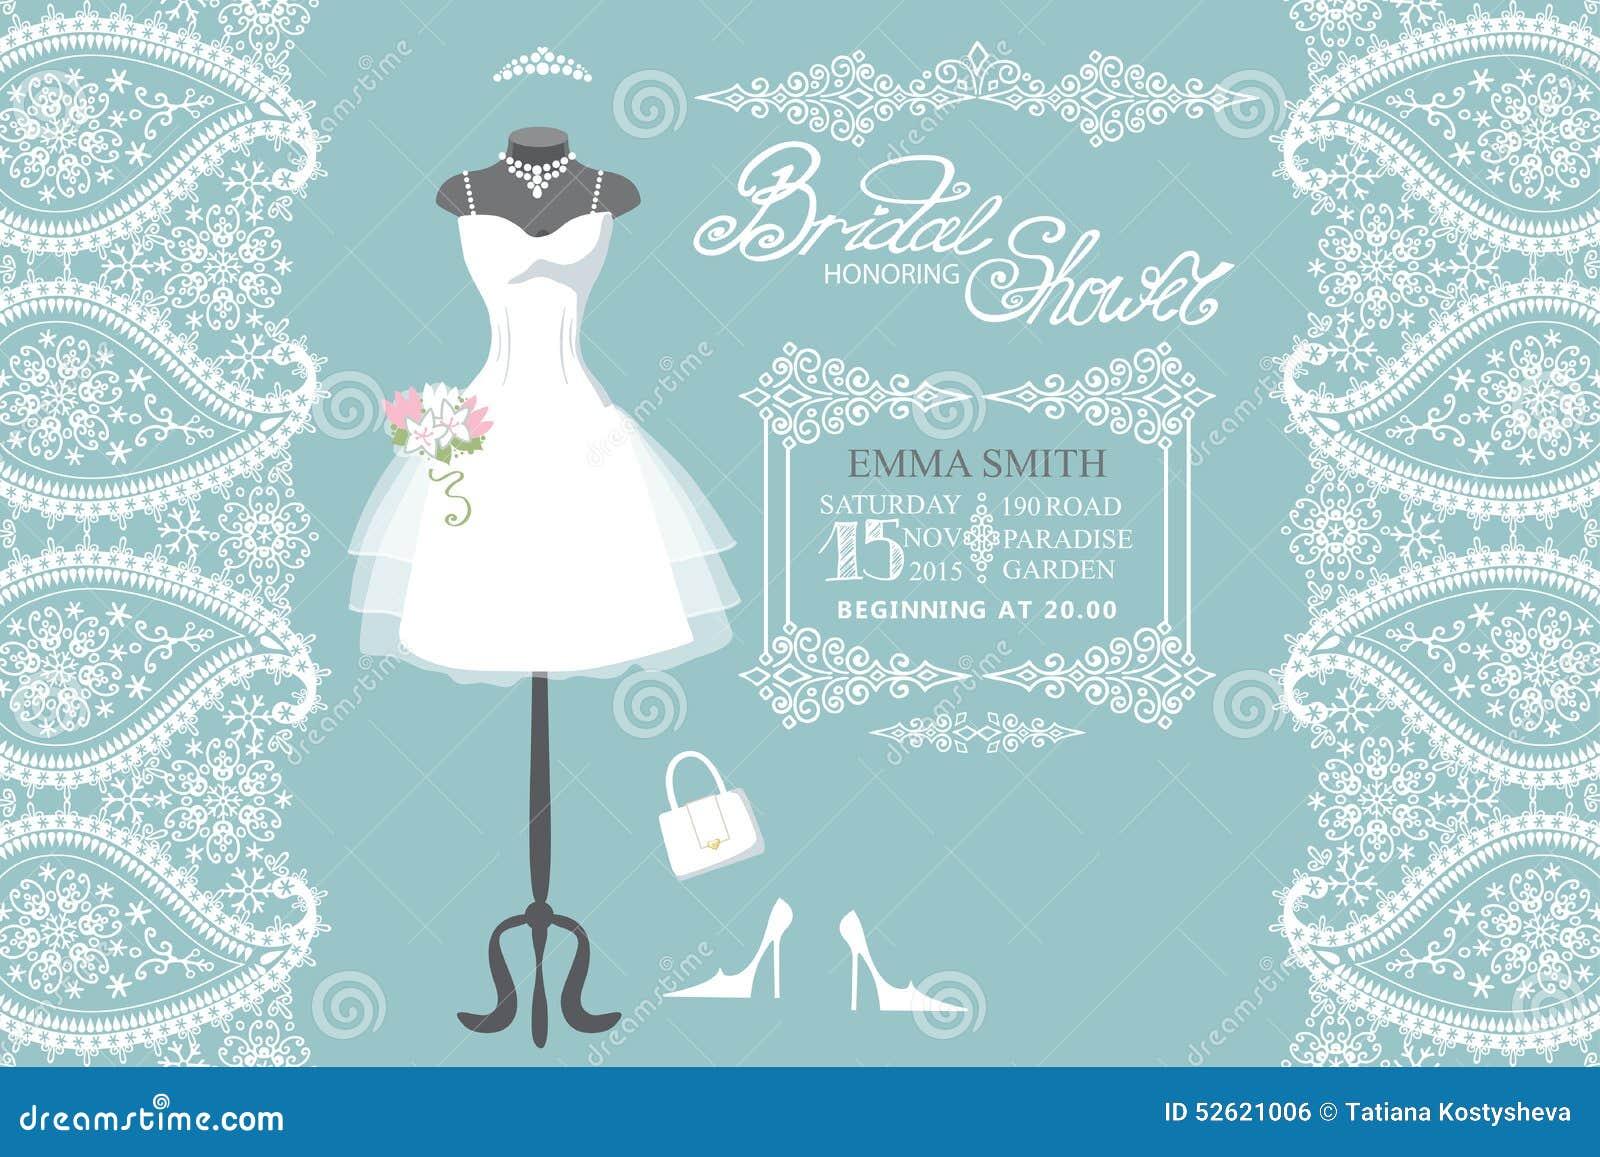 Wedding Bridal Dress With Winter Paisley Border Stock Vector ...